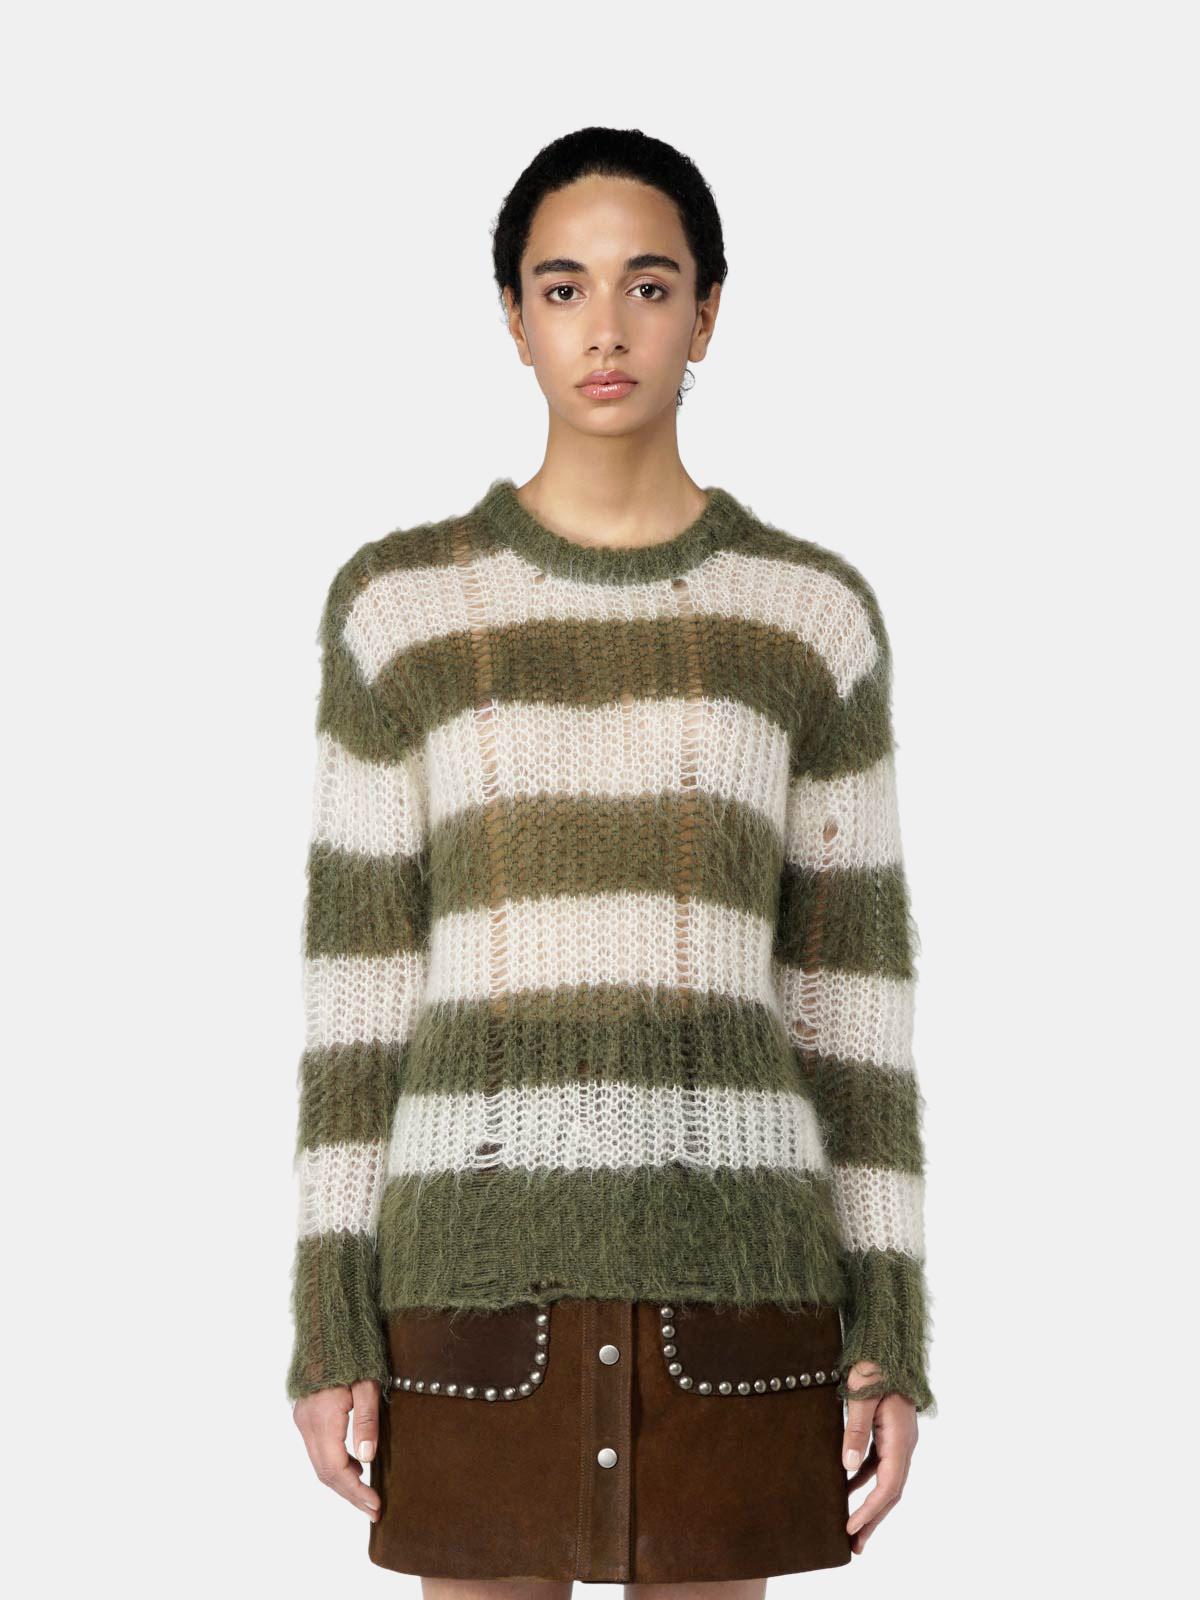 Golden Goose - Maglione Antonica in lana mohair a righe verdi e bianche in